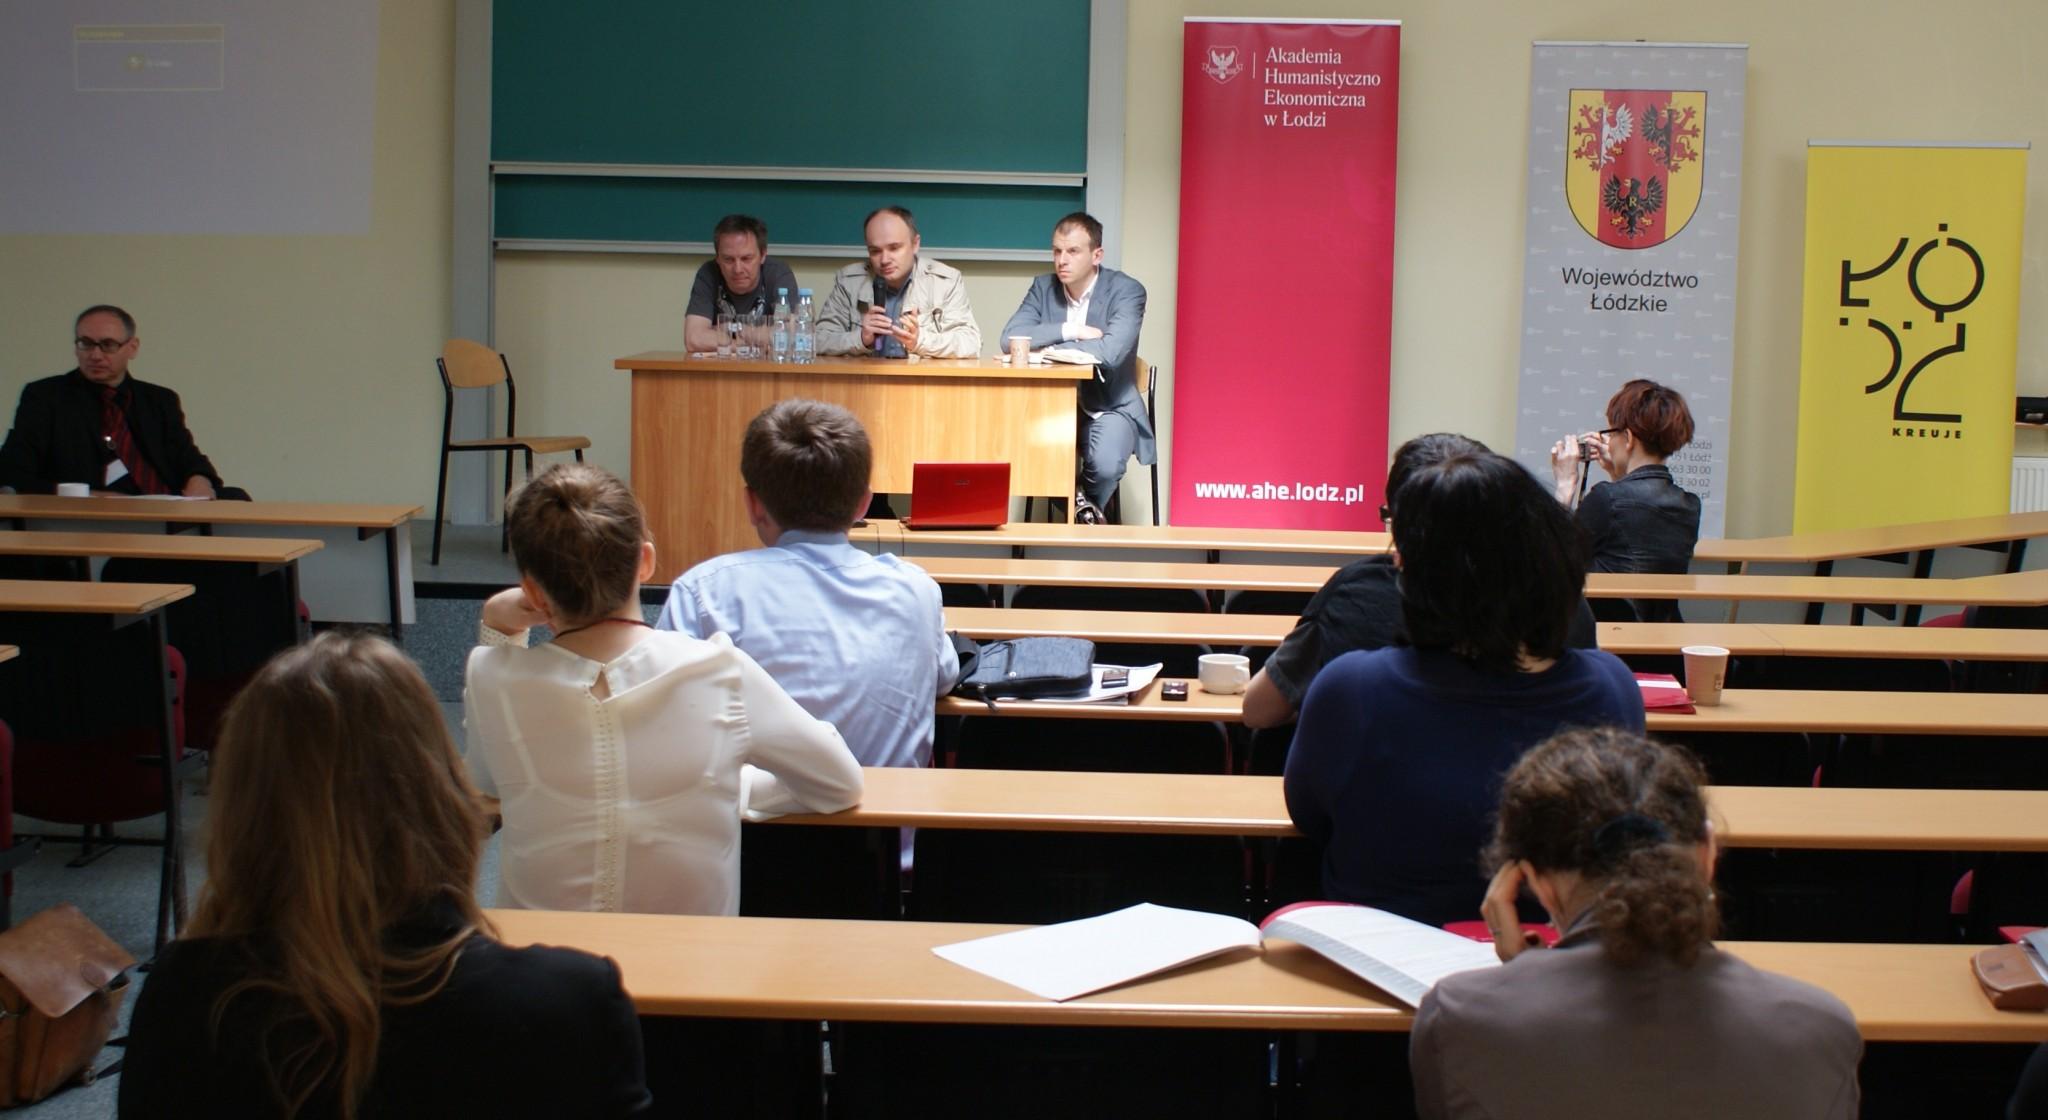 Dziennikarski Panel Dyskusyjny